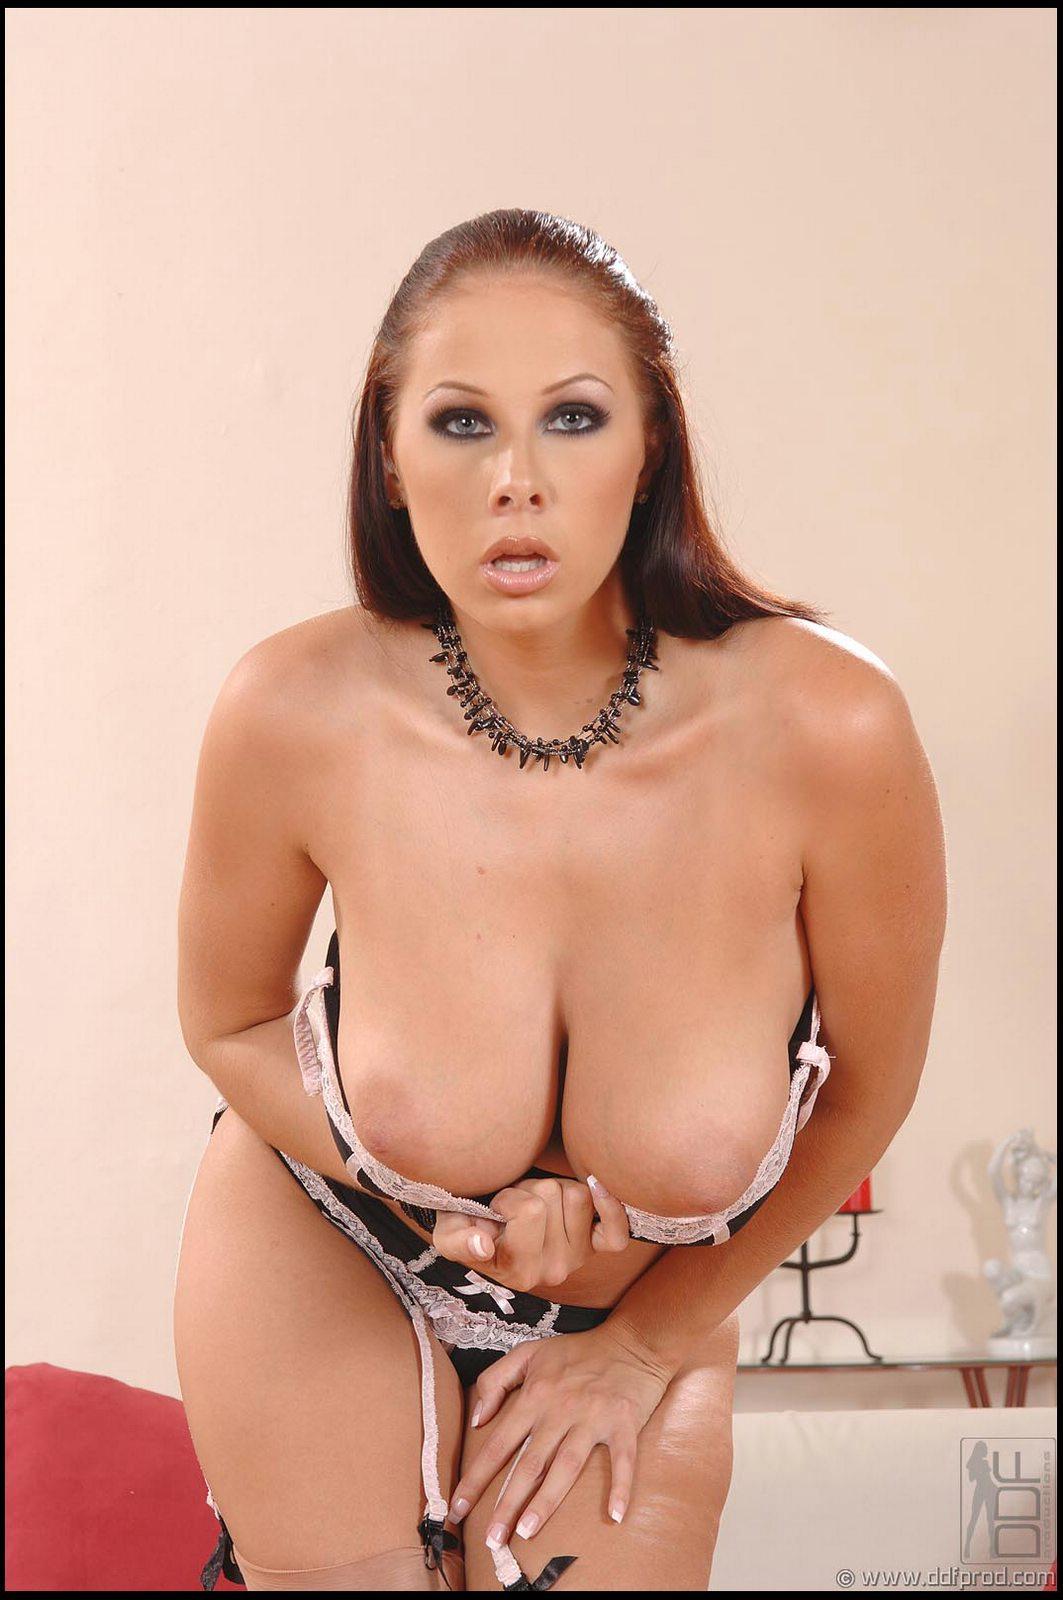 Gianna michaels pornstar